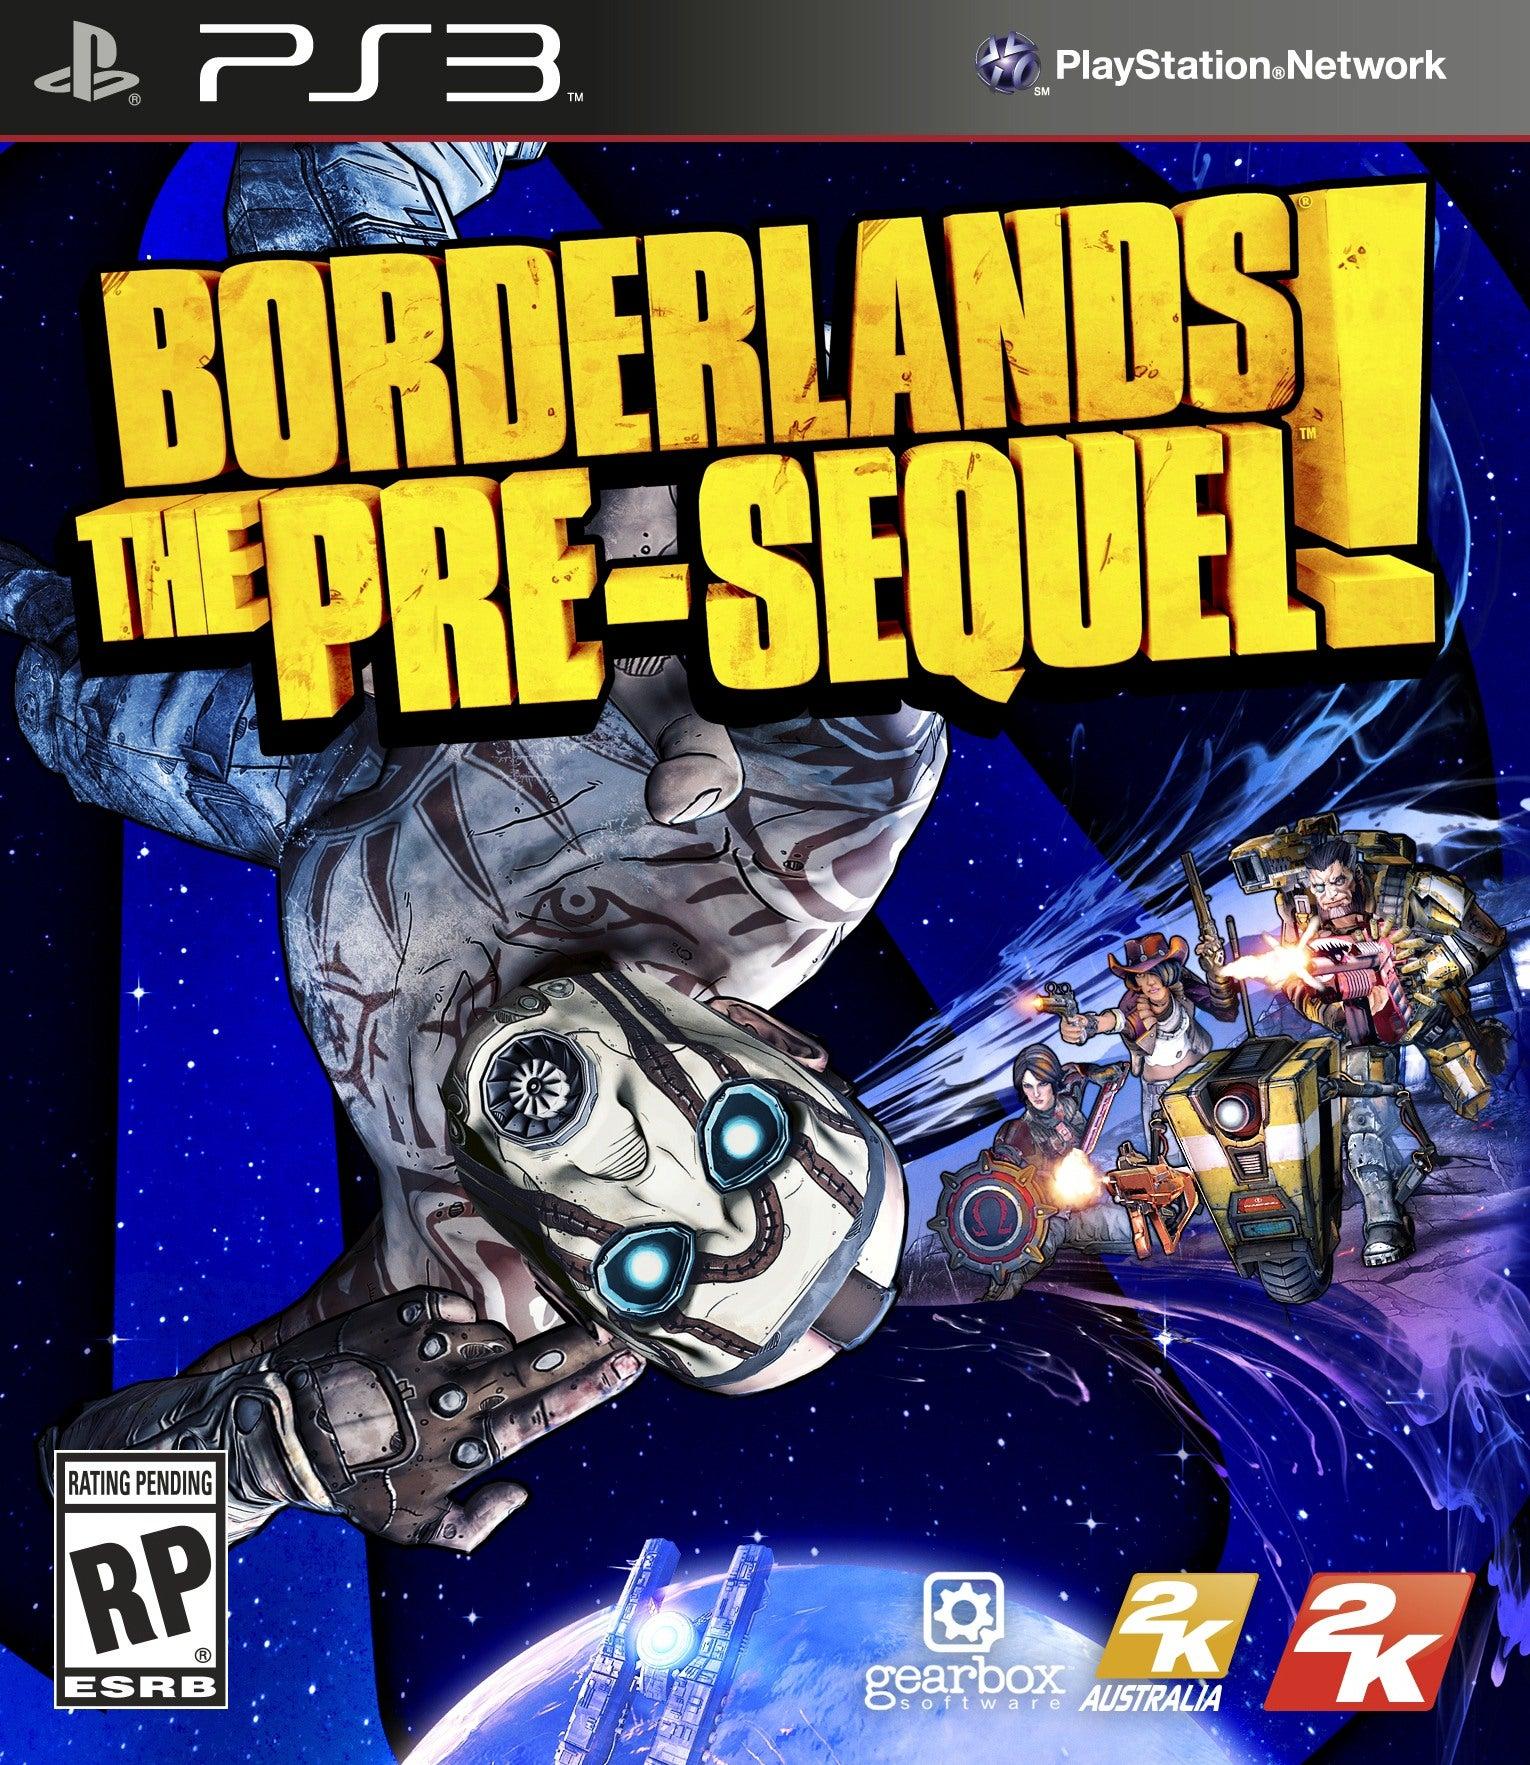 Borderlands The Pre Sequel Cheats Codes Unlockables PlayStation 3 IGN